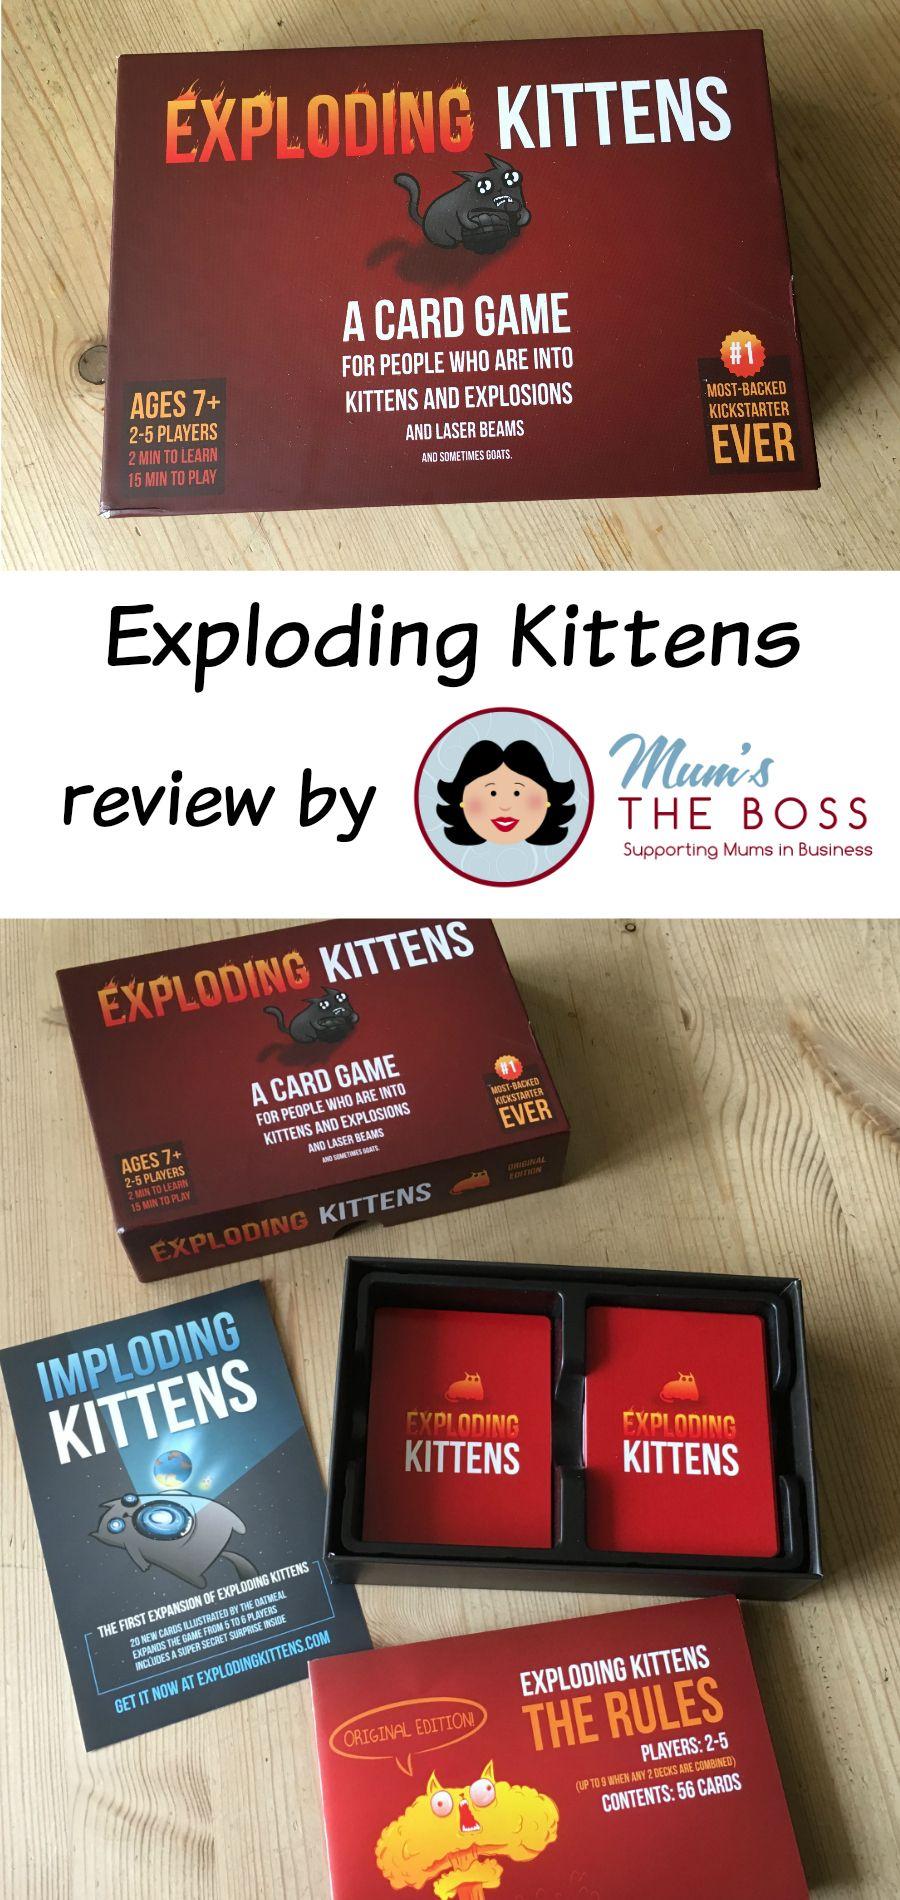 Family Games Night Review of Exploding Kittens Family